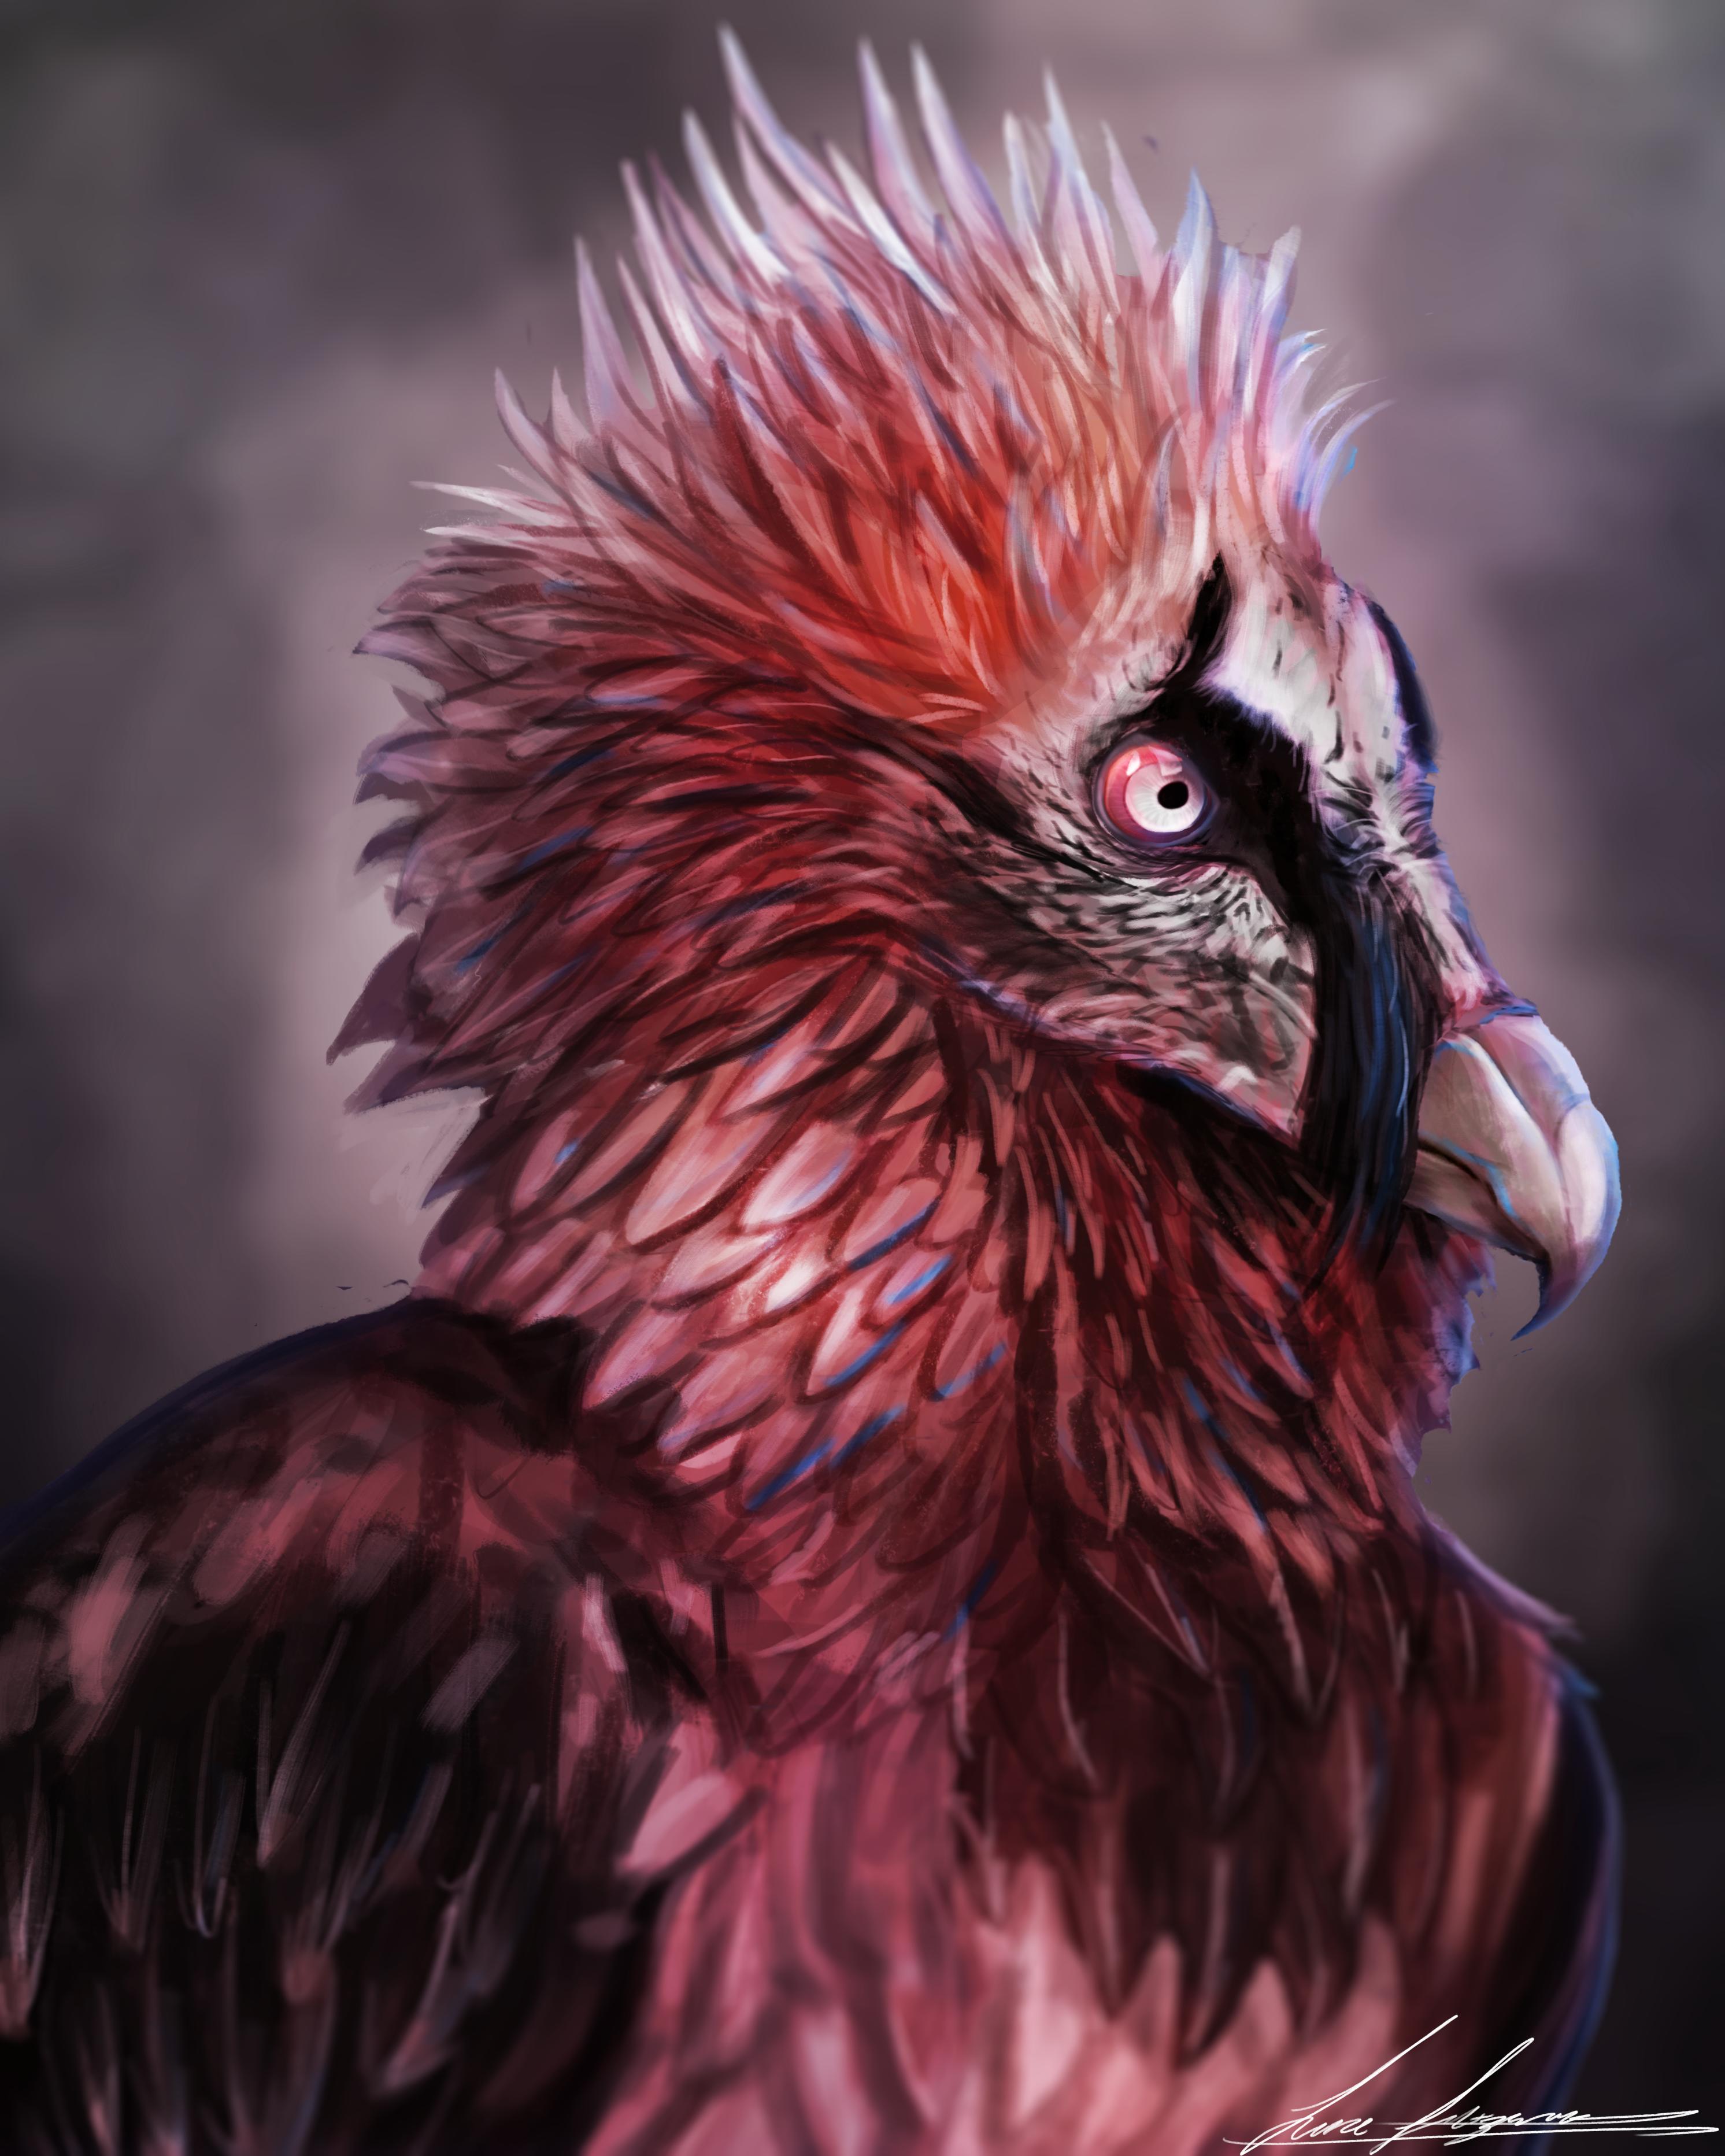 Bearded Vulture by LukeF on Newgrounds